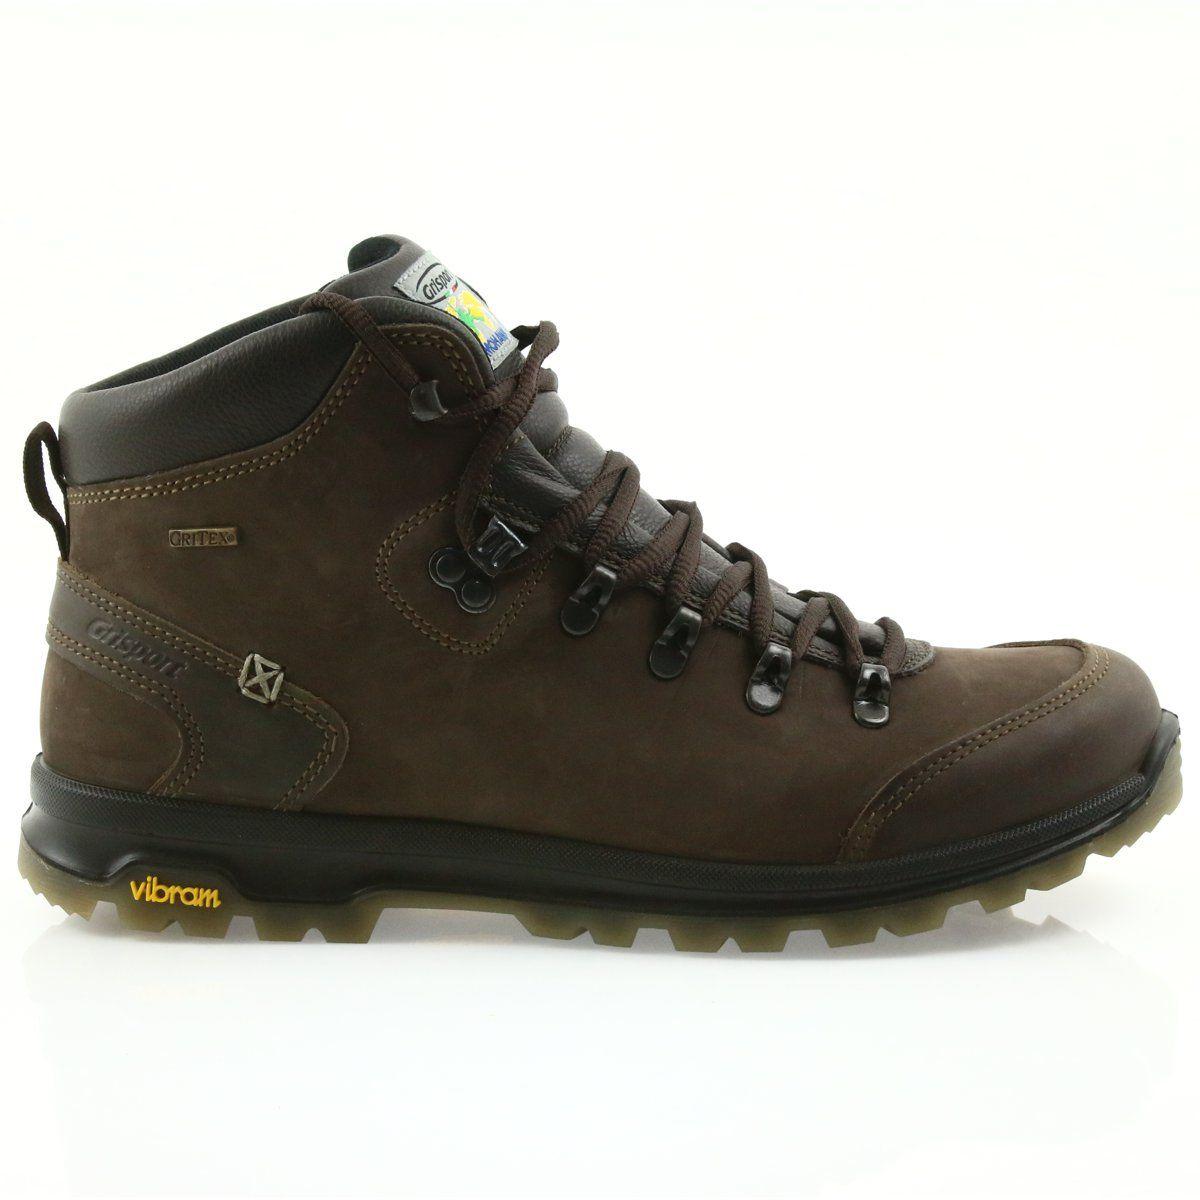 Grisport Brazowe Buty Trekkingowe Boots Hiking Boots Shoes